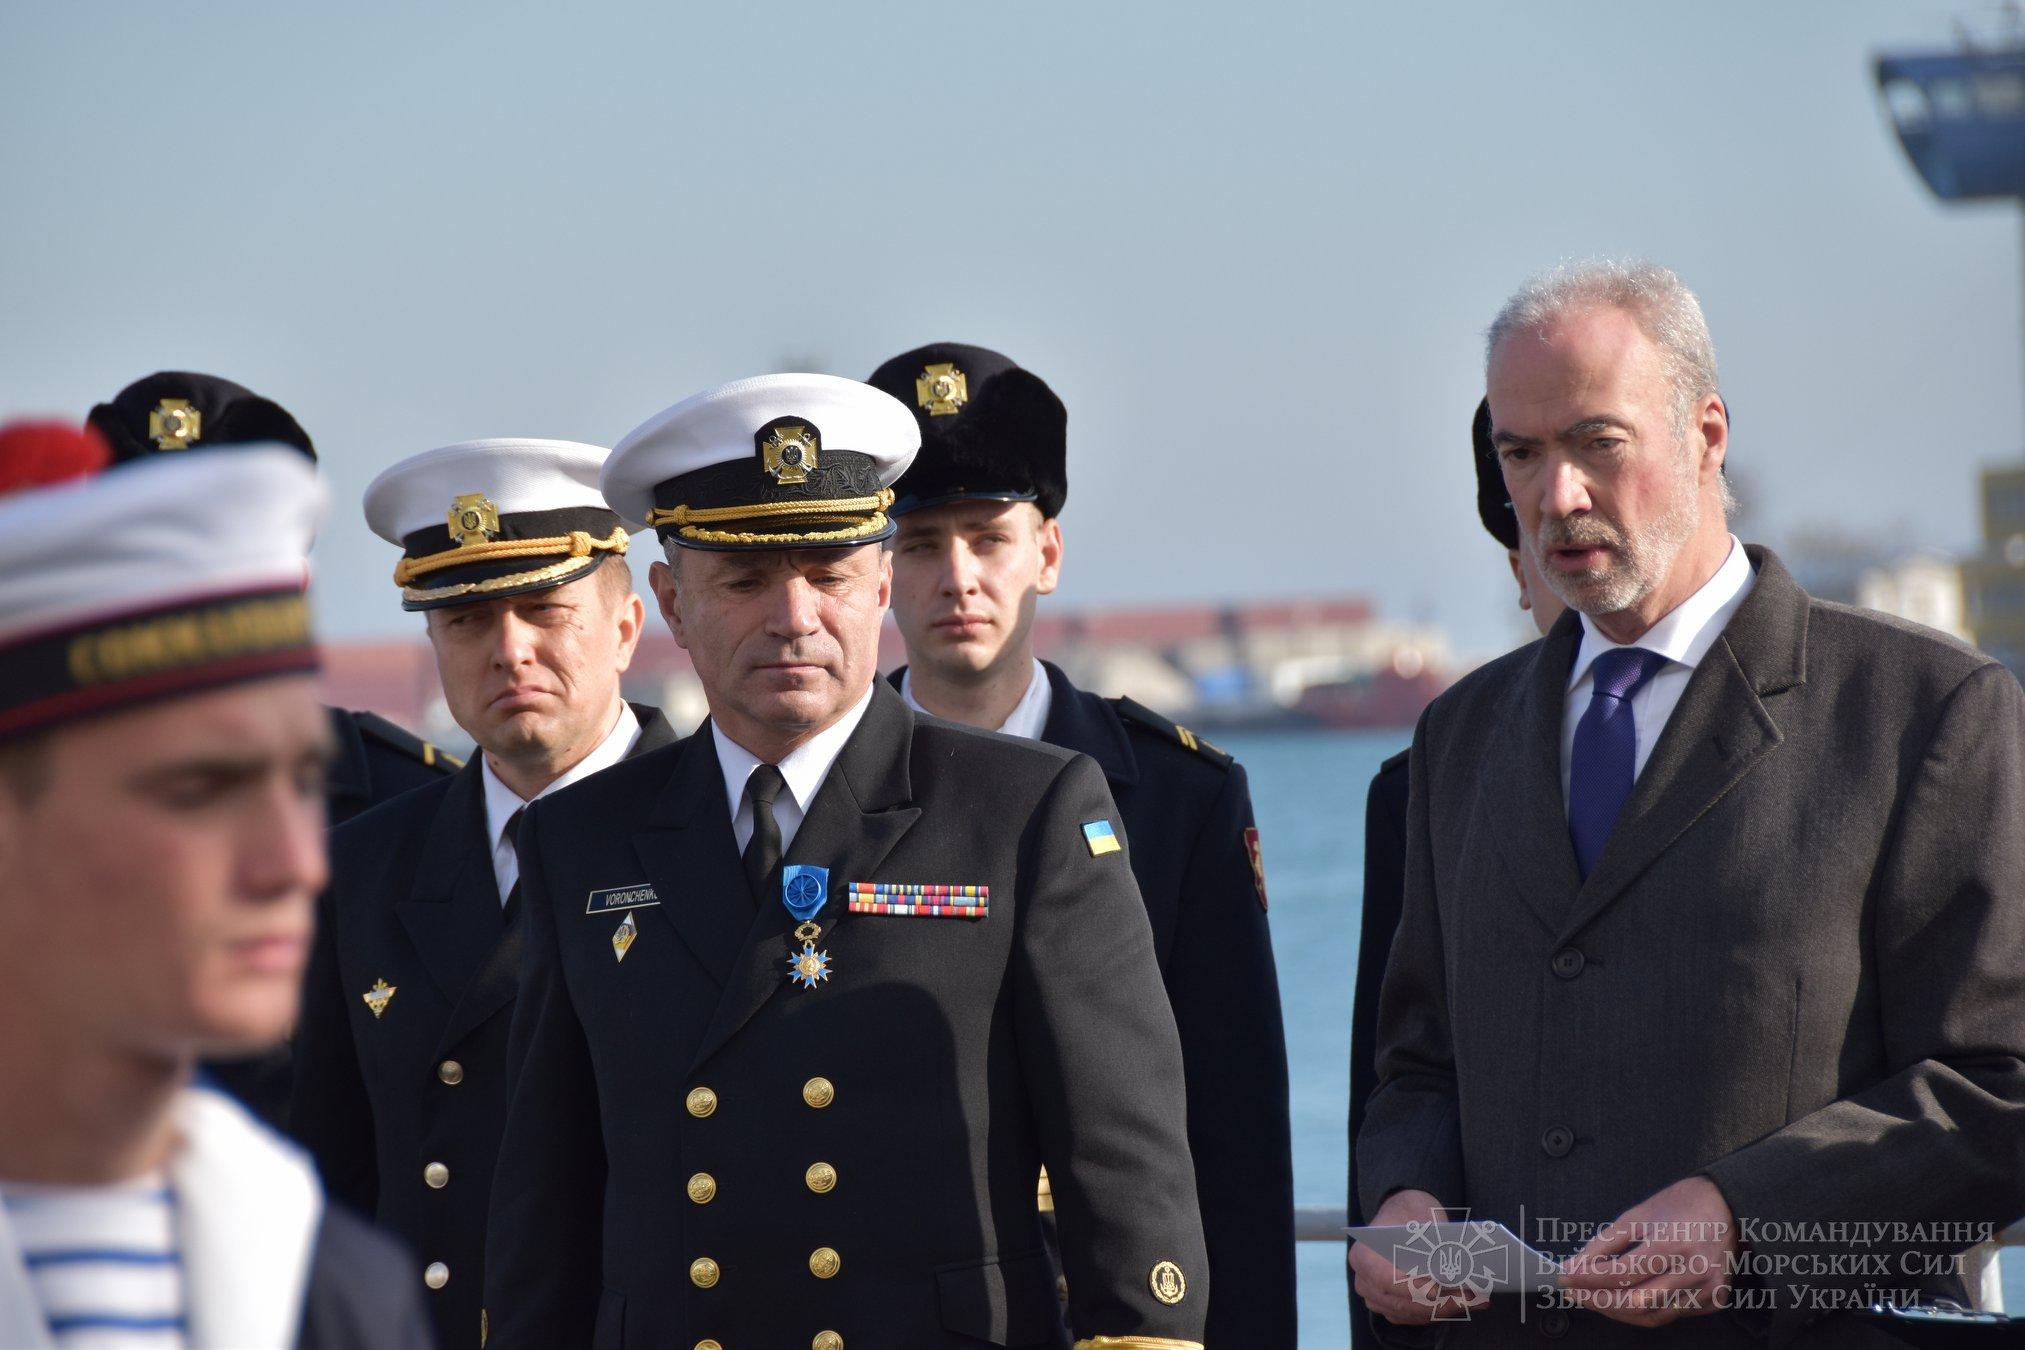 Макрон нагородив командувача ВМС України Воронченка орденом